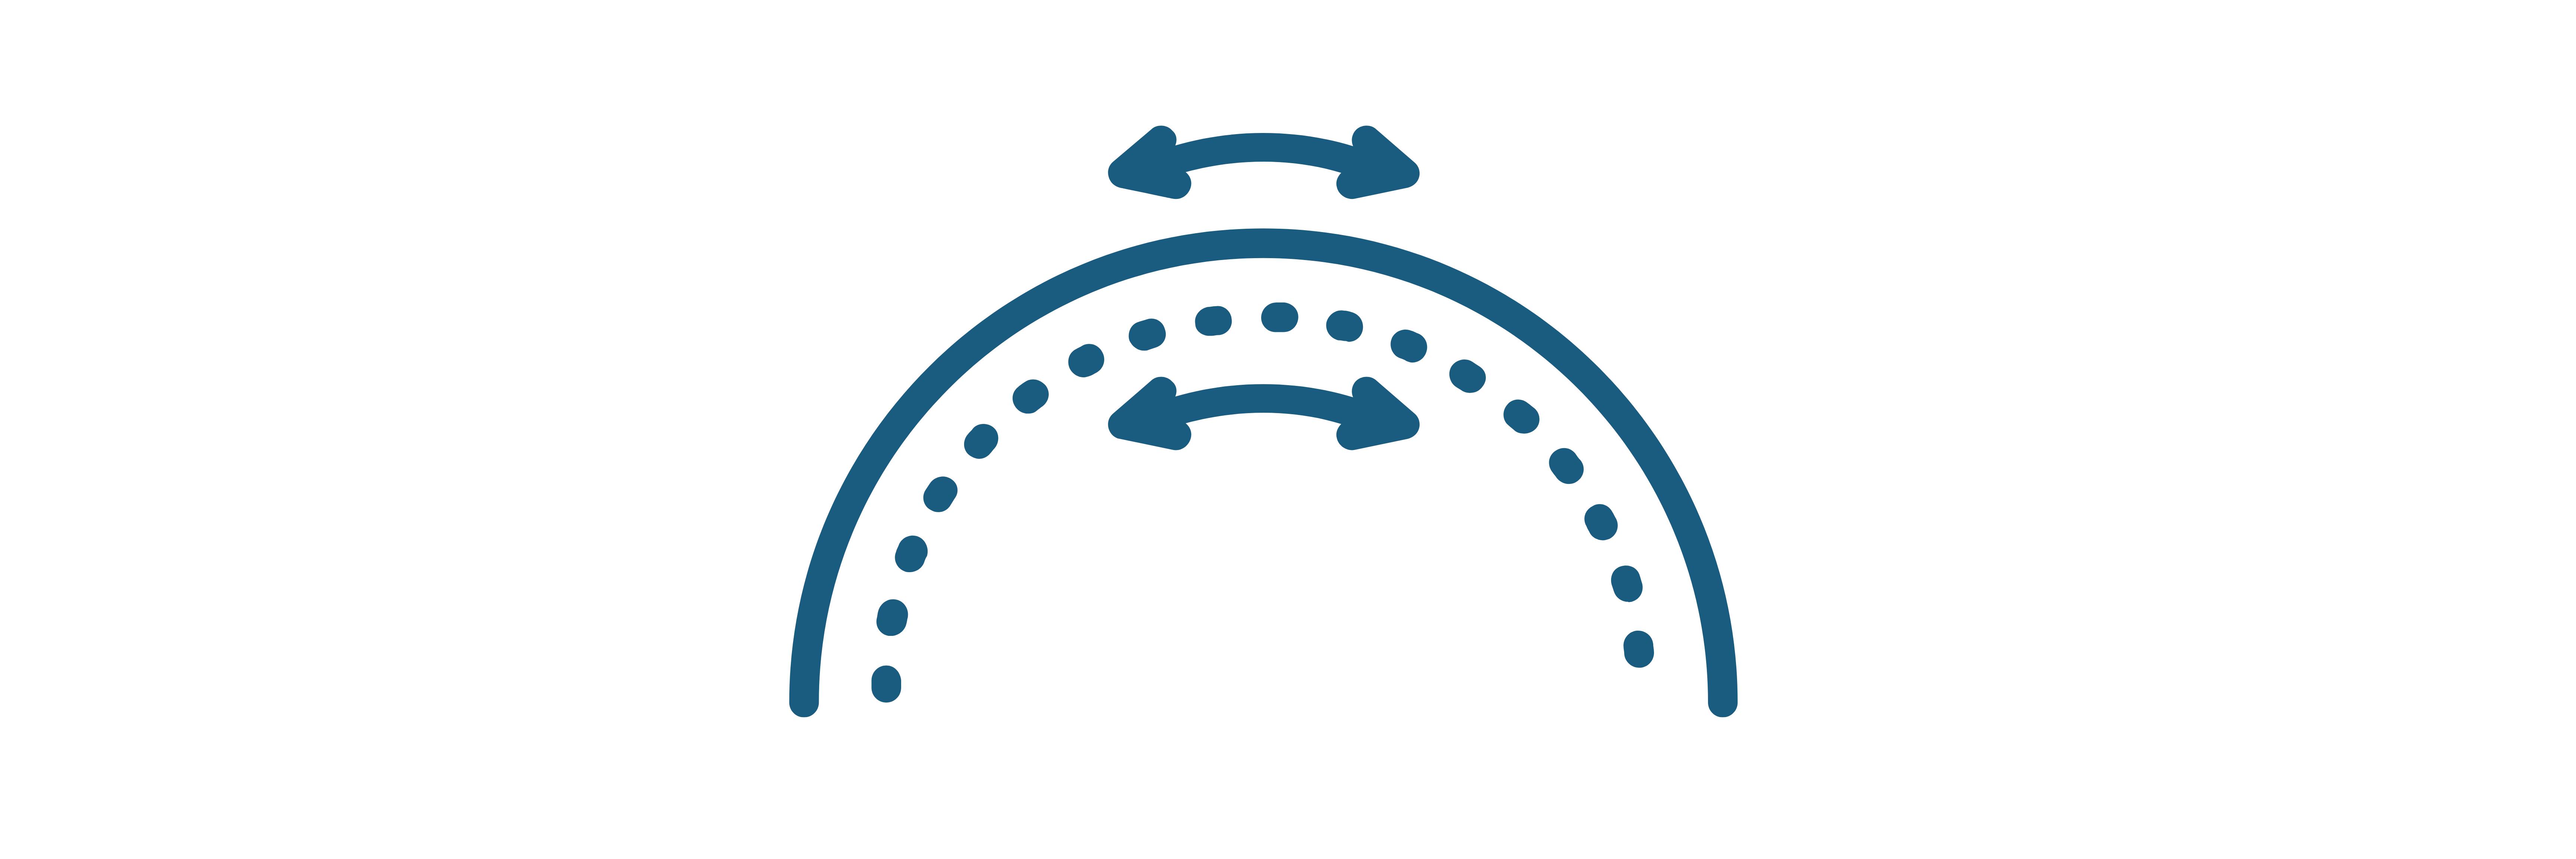 automated payment system advantages-flexebility